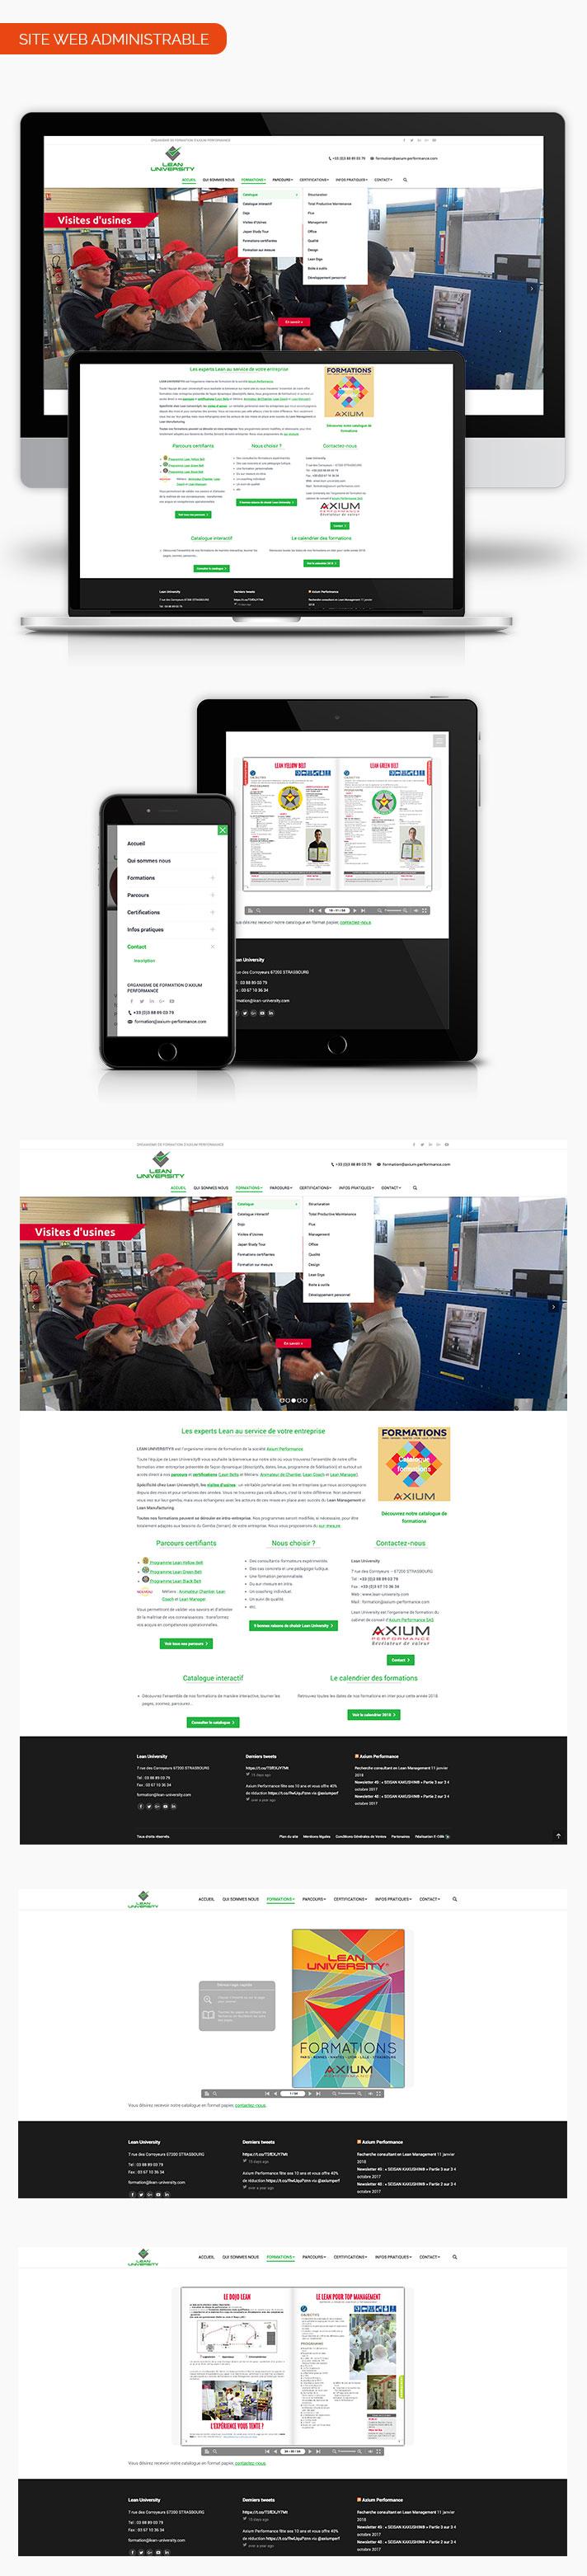 Mockup page site internet Lean university